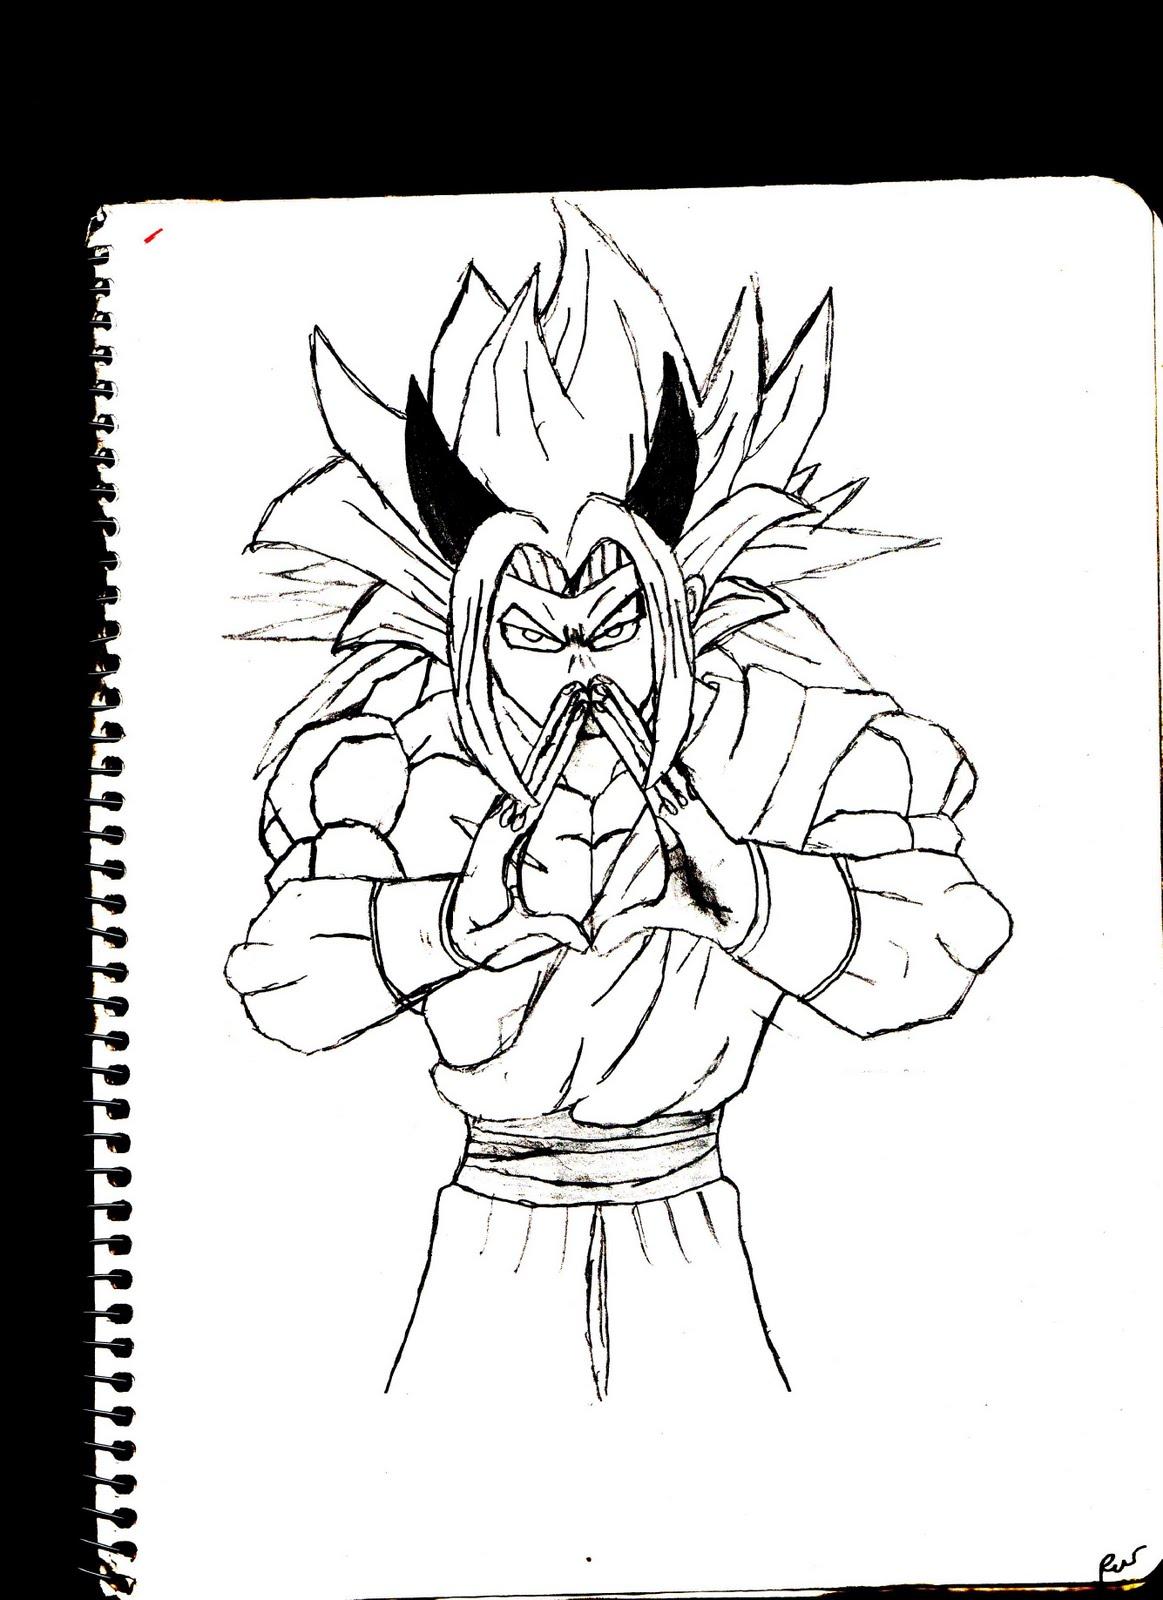 Imagenes Dibujos De Dragon Ball Z